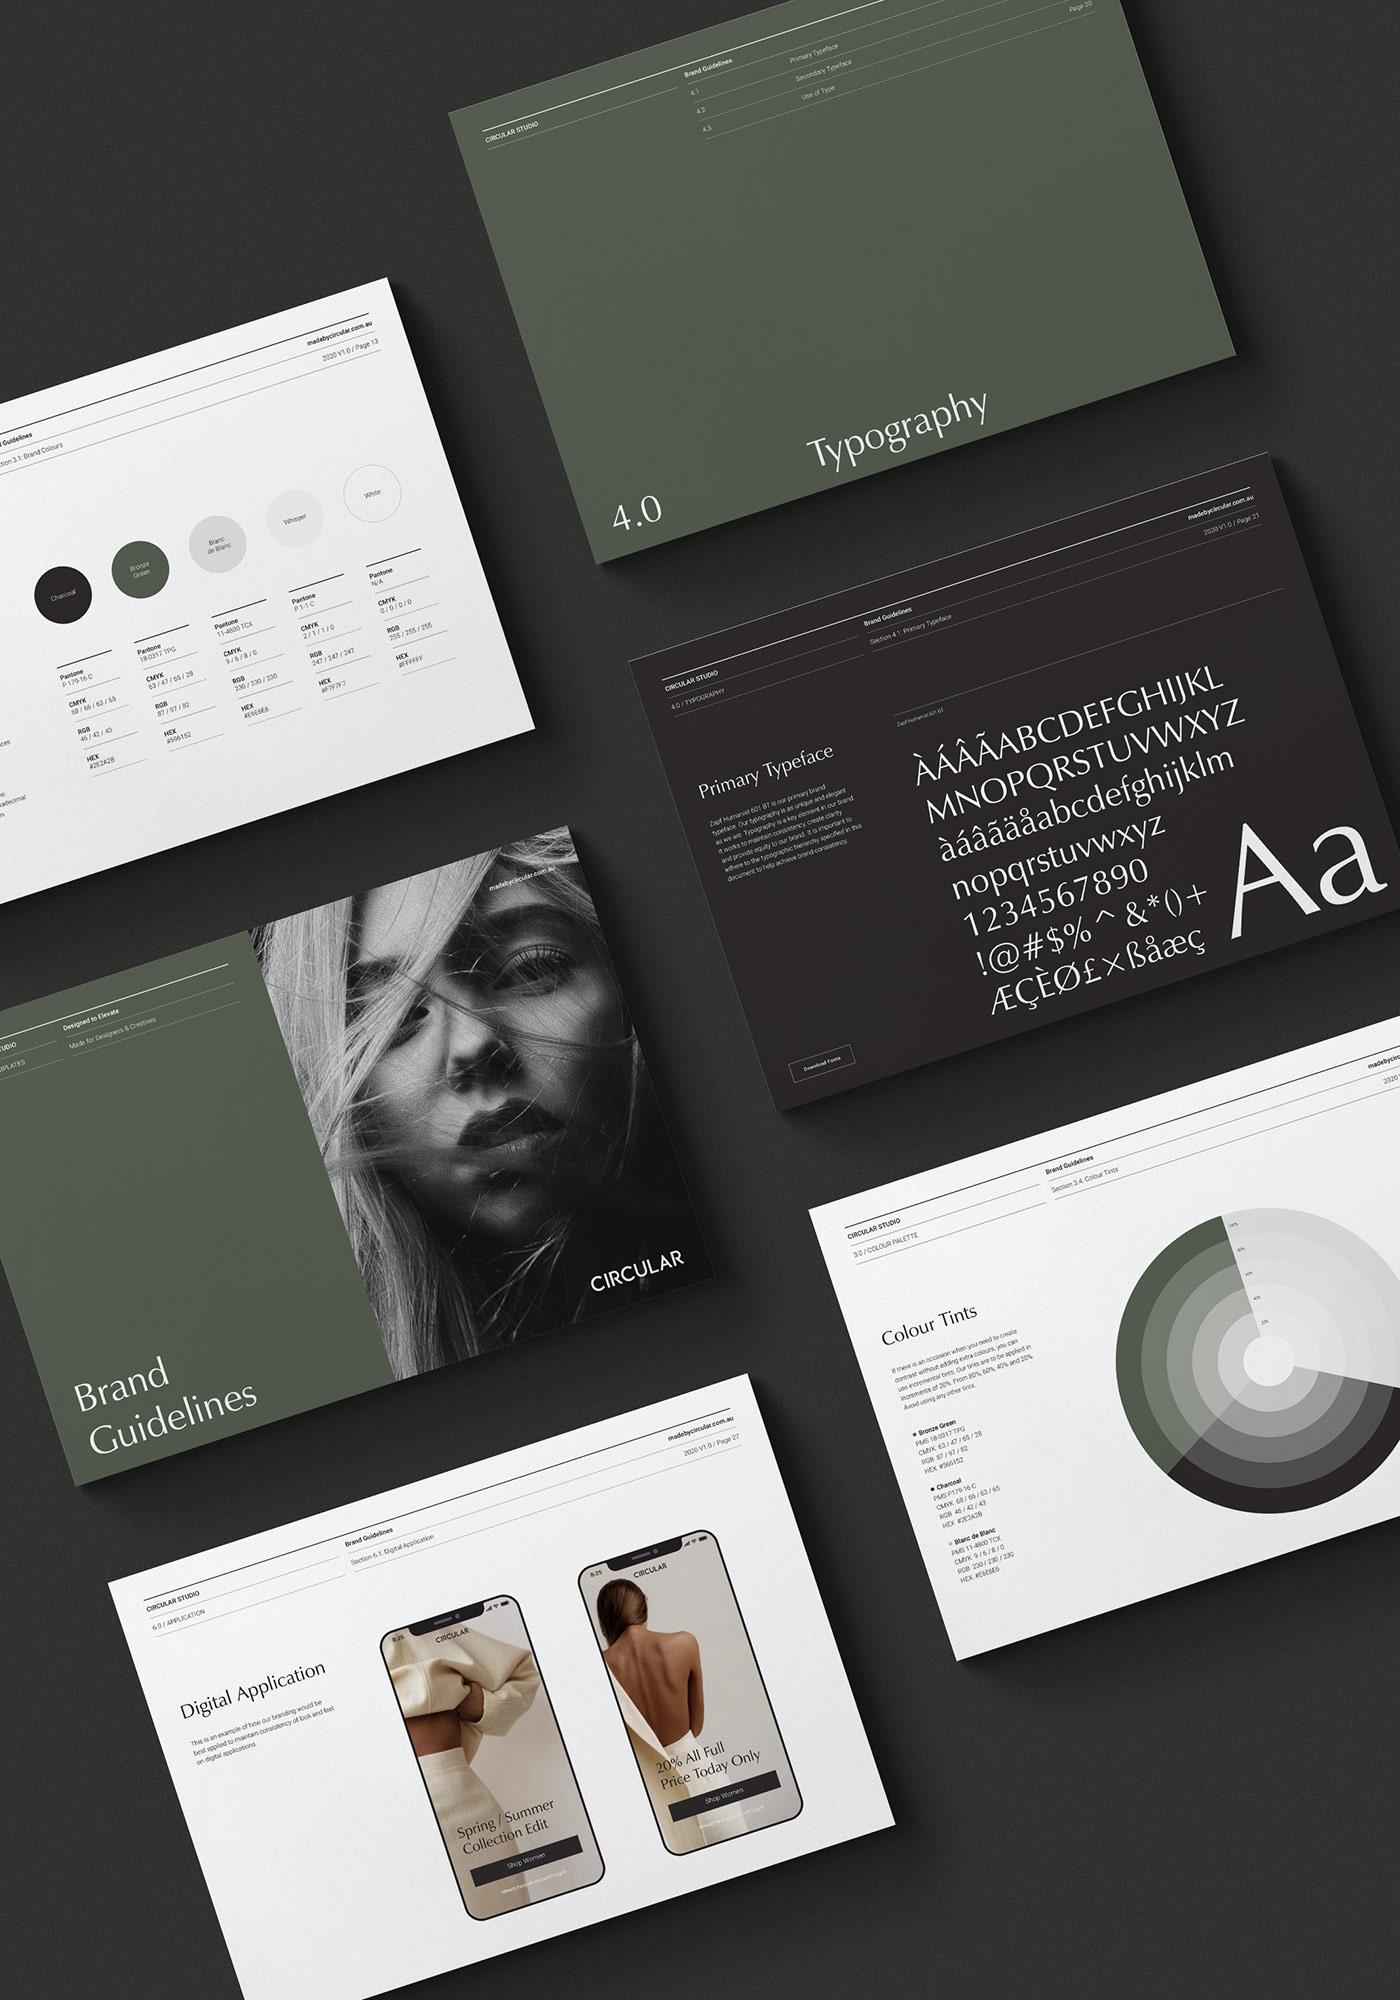 Odessa Brand Style Guide Template